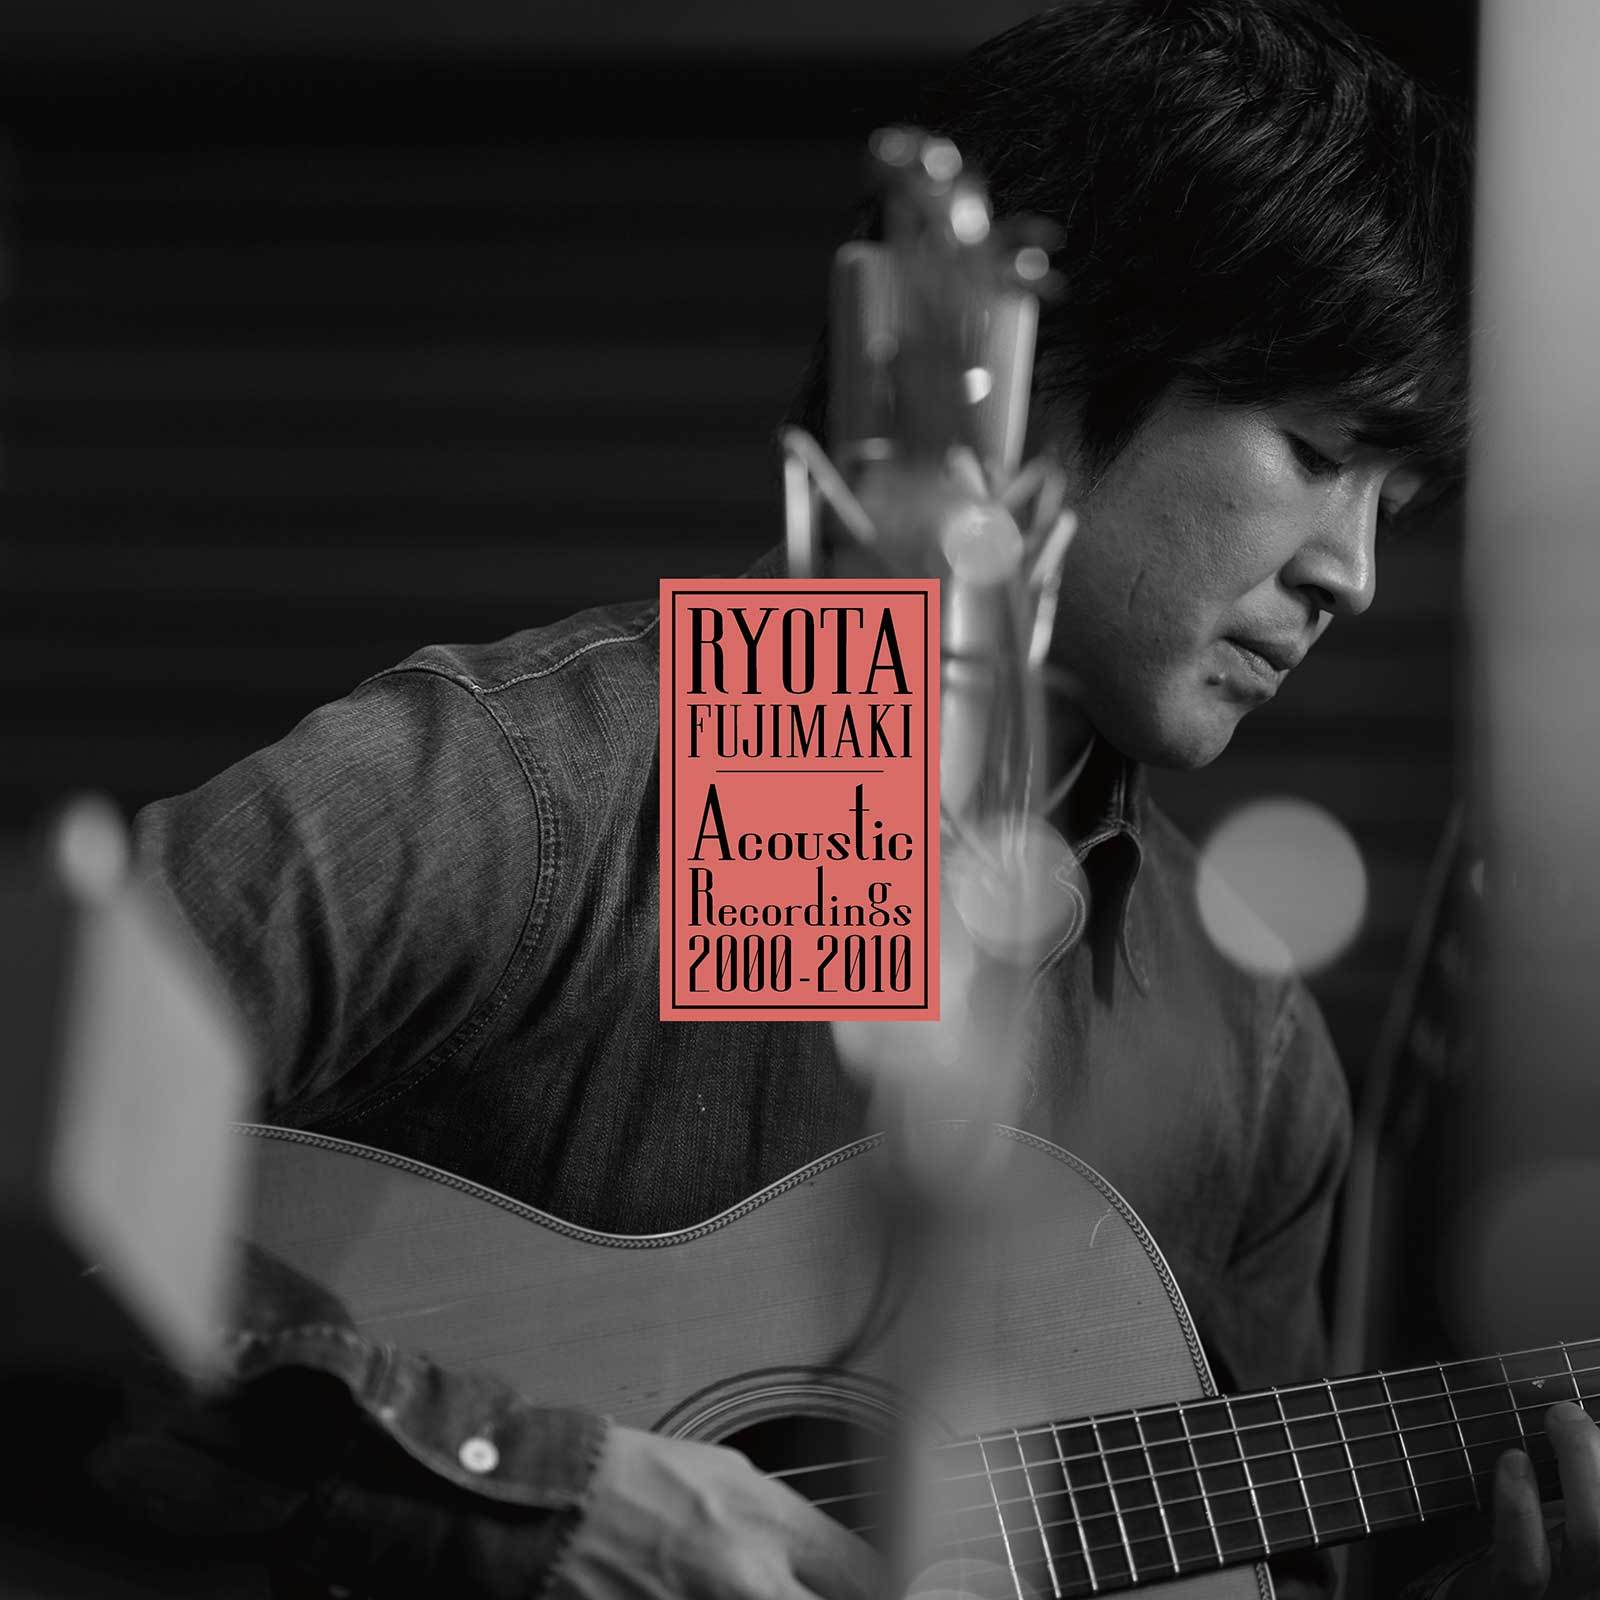 『RYOTA FUJIMAKI Acoustic Recordings 2000-2010』